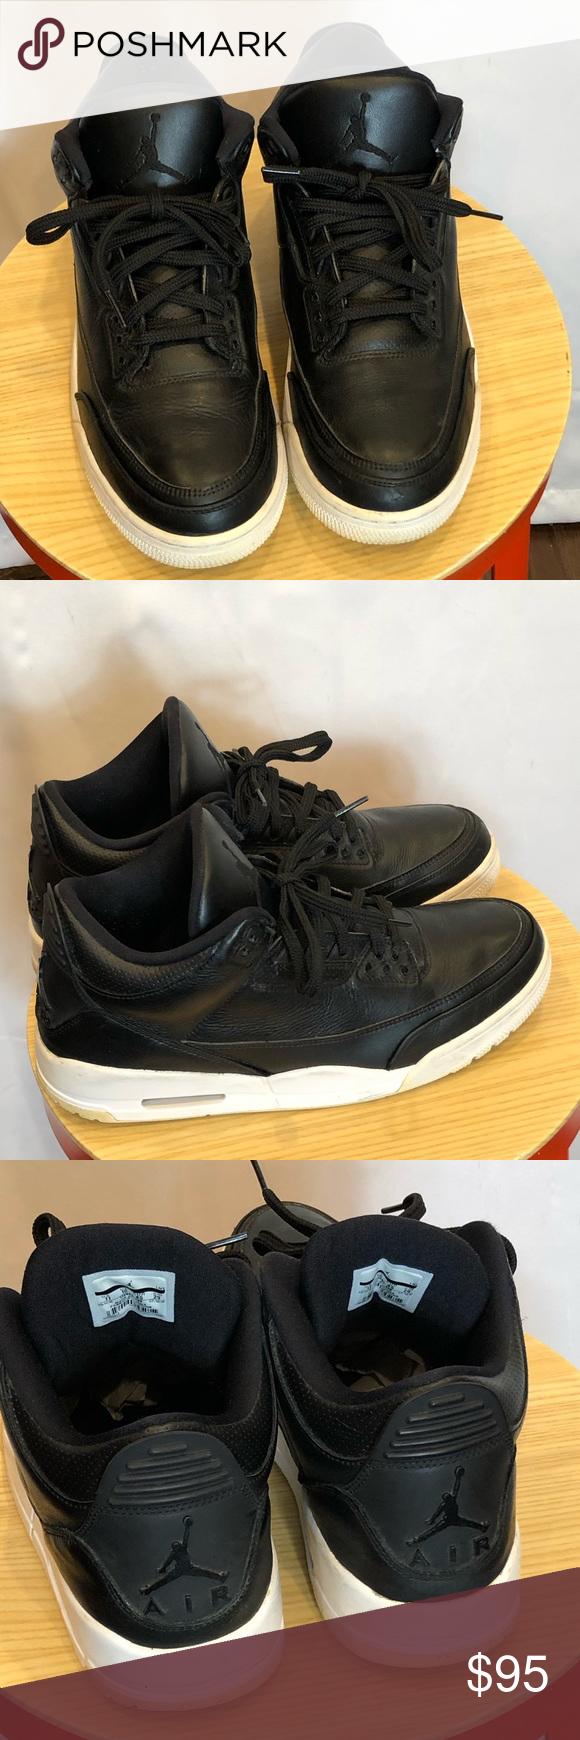 Nike Cyber Monday Jordan 3 Retro Soles Sz 11 Jordan 3 Nike Jordans